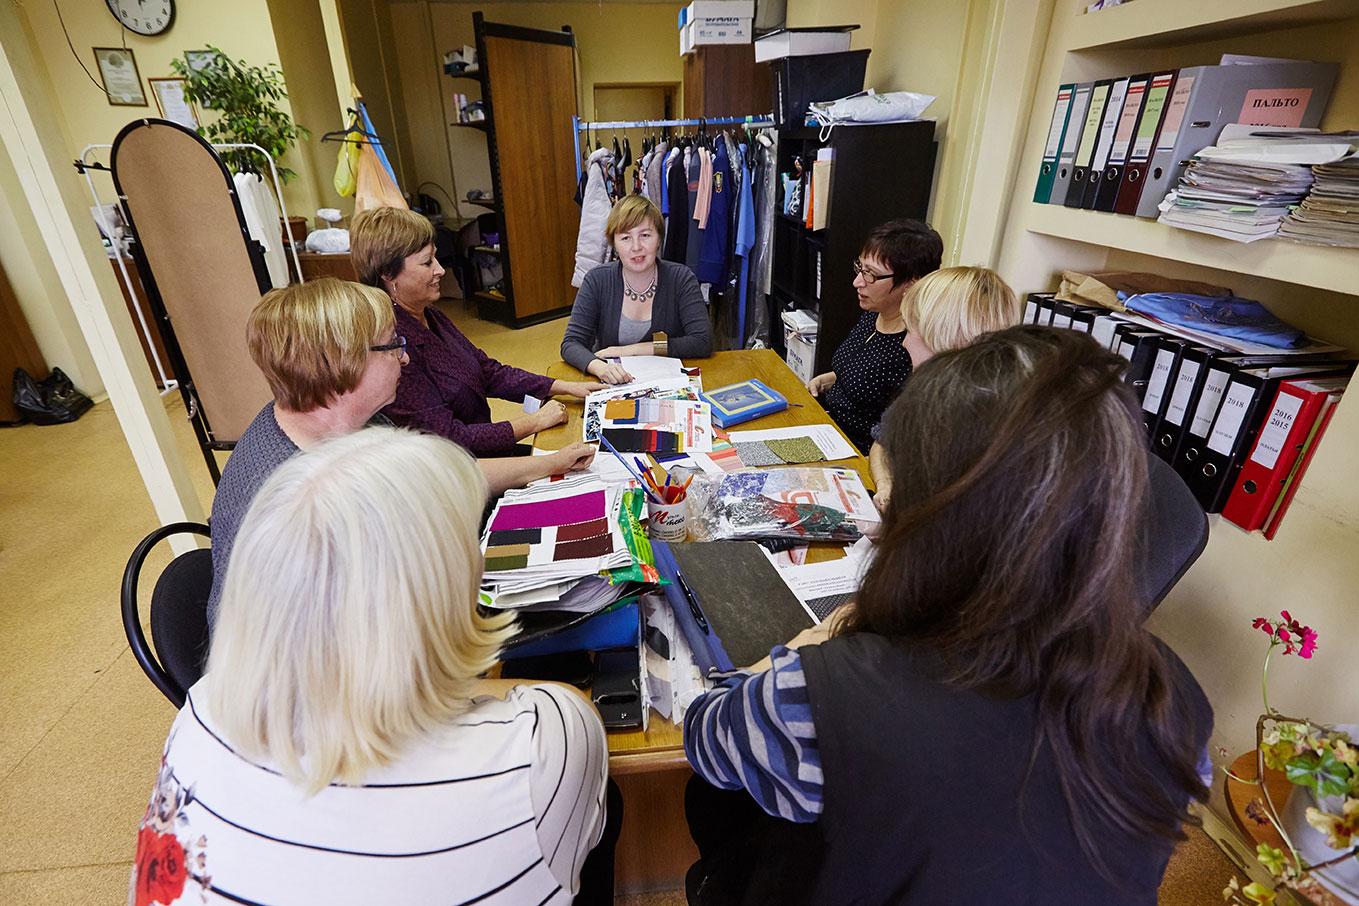 собрание на швейном производстве фото